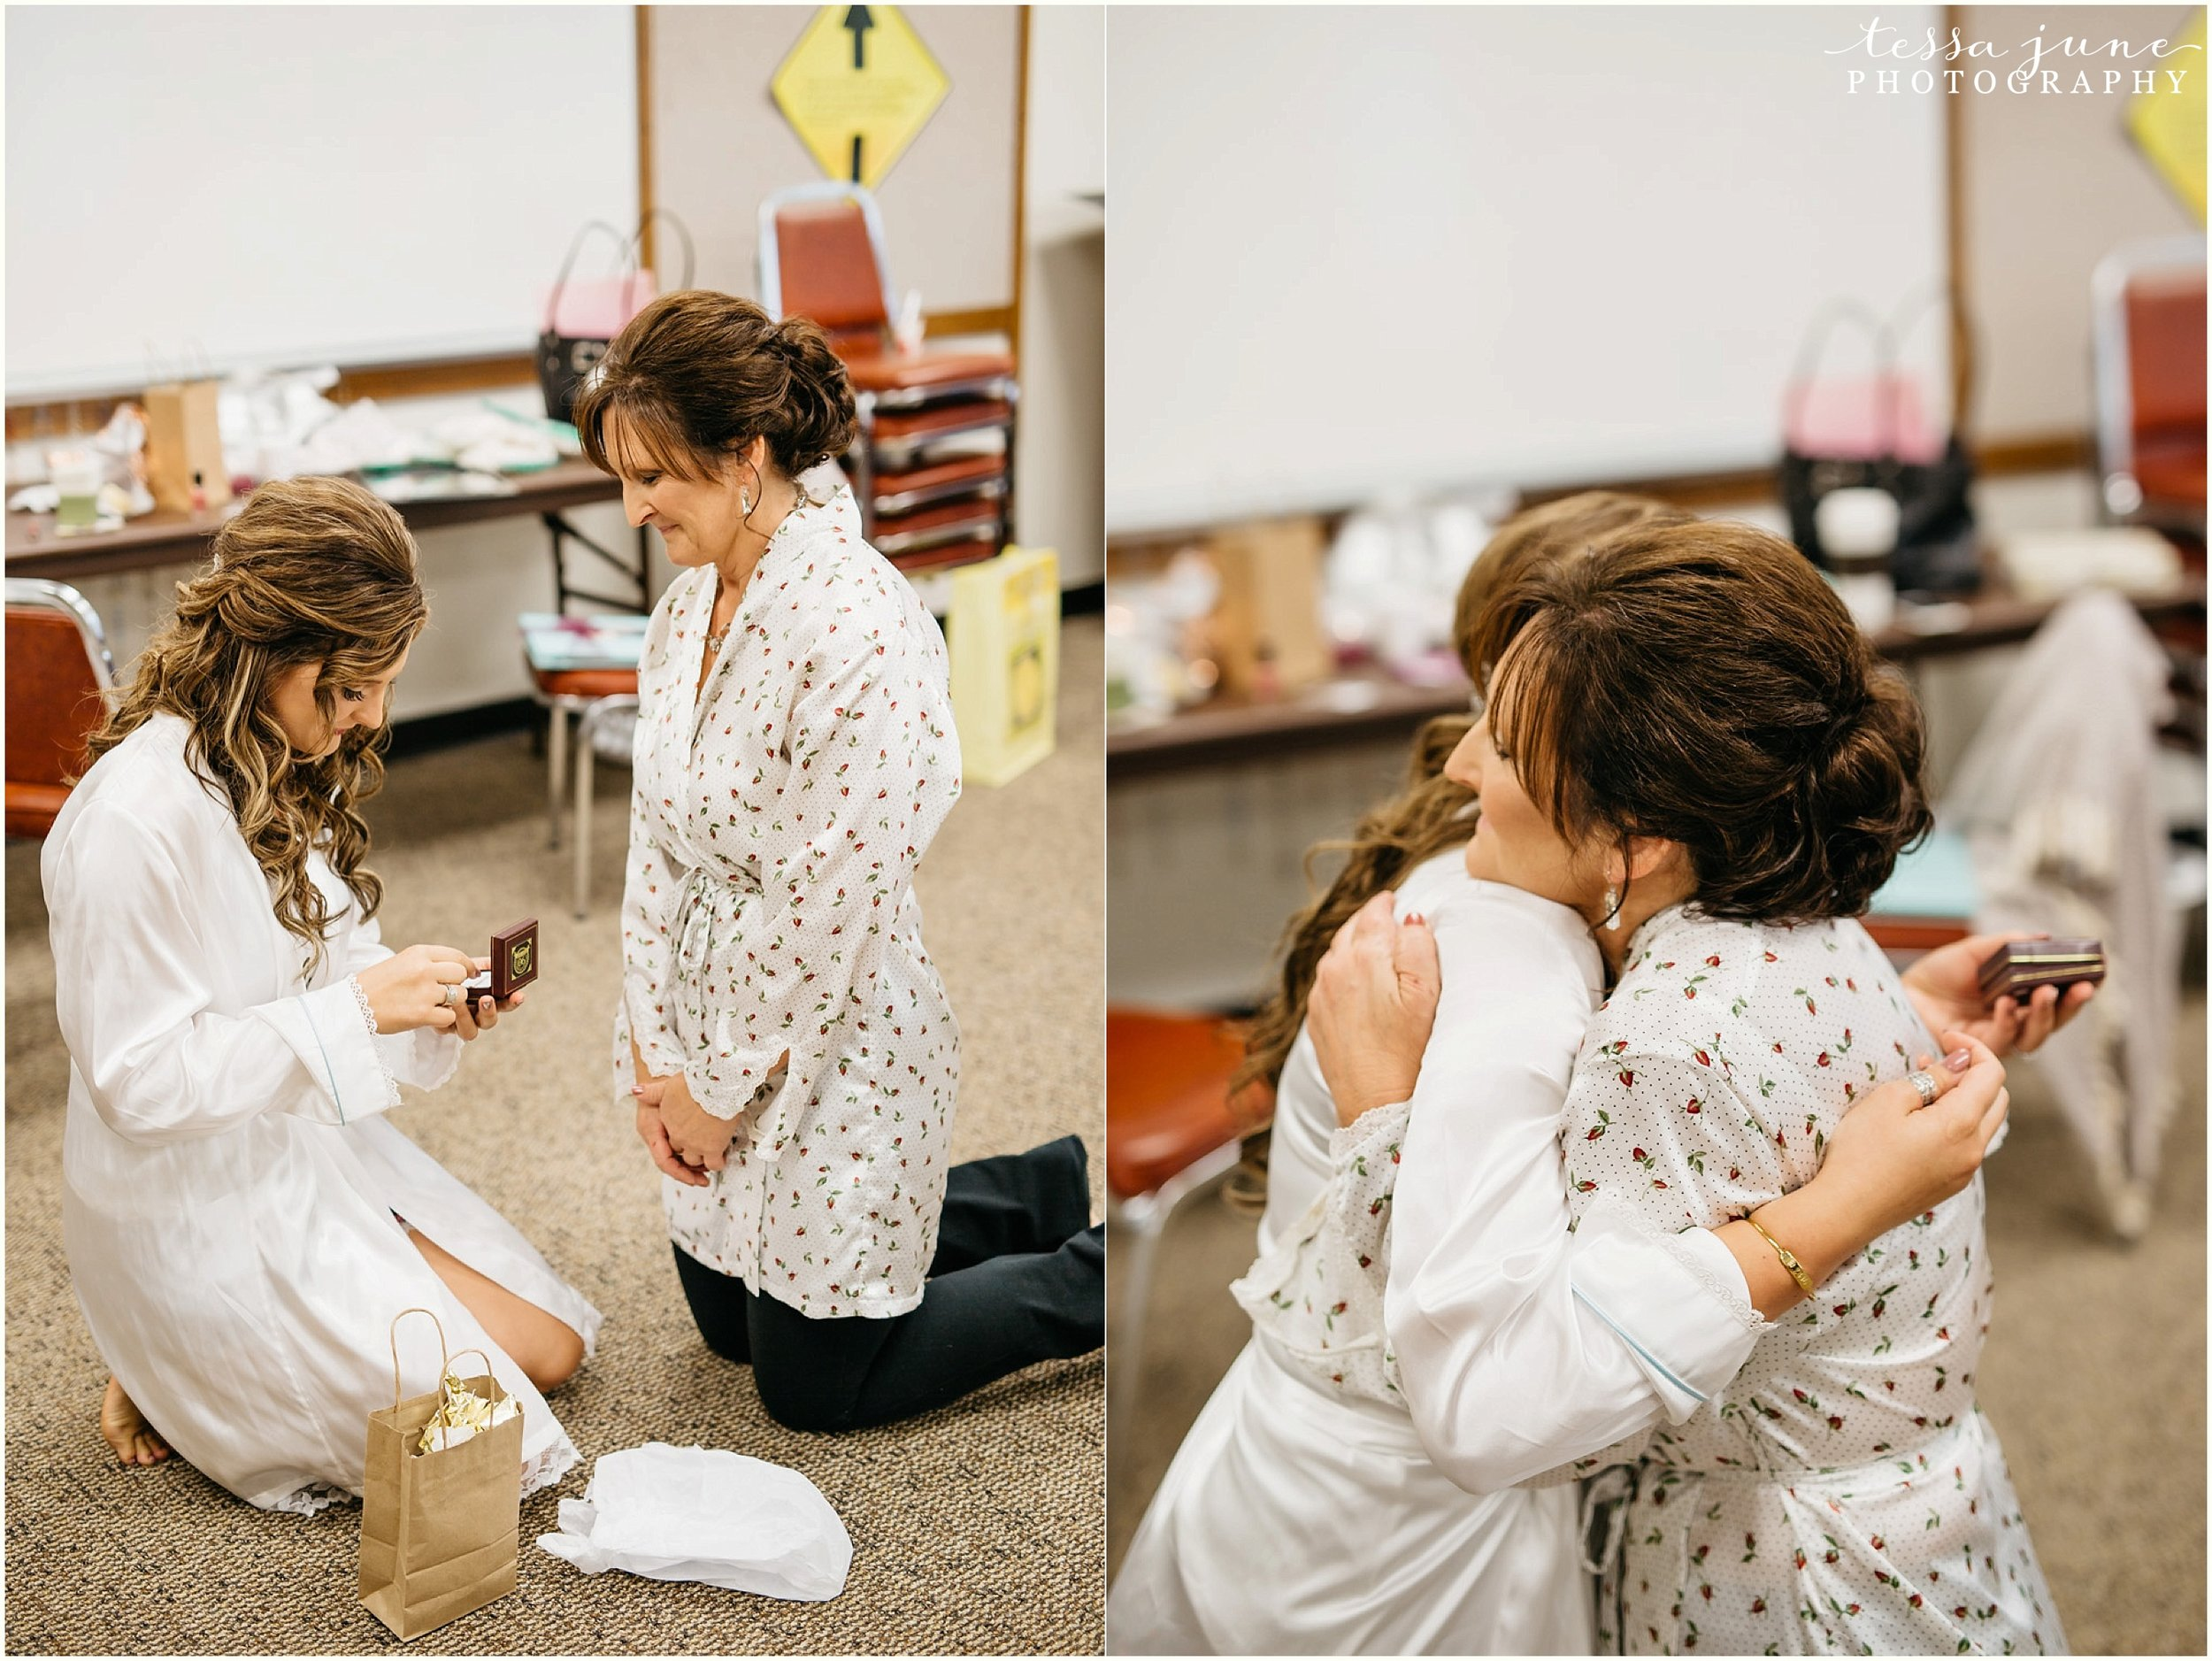 bohemian-minnesota-wedding-mismatched-bridesmaid-dresses-waterfall-st-cloud-tessa-june-photography-17.jpg